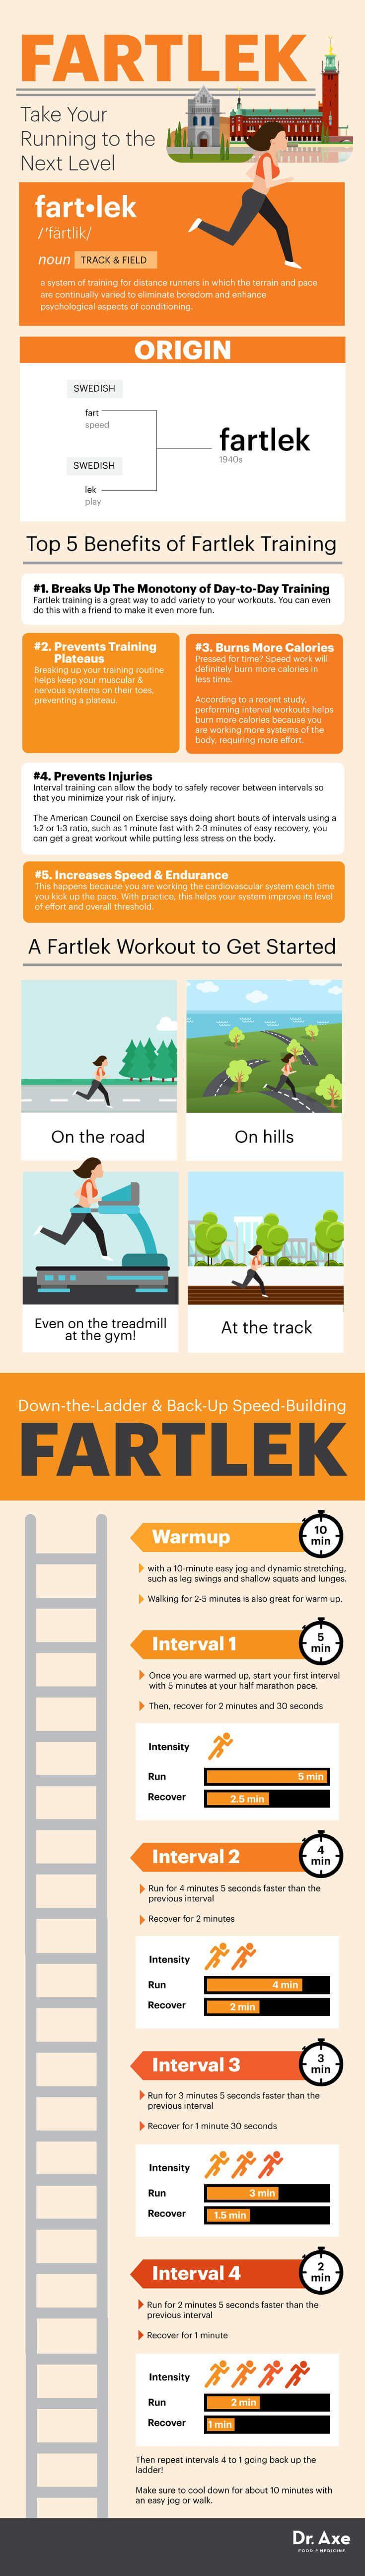 fartlek a swiss training trick for better running. Black Bedroom Furniture Sets. Home Design Ideas